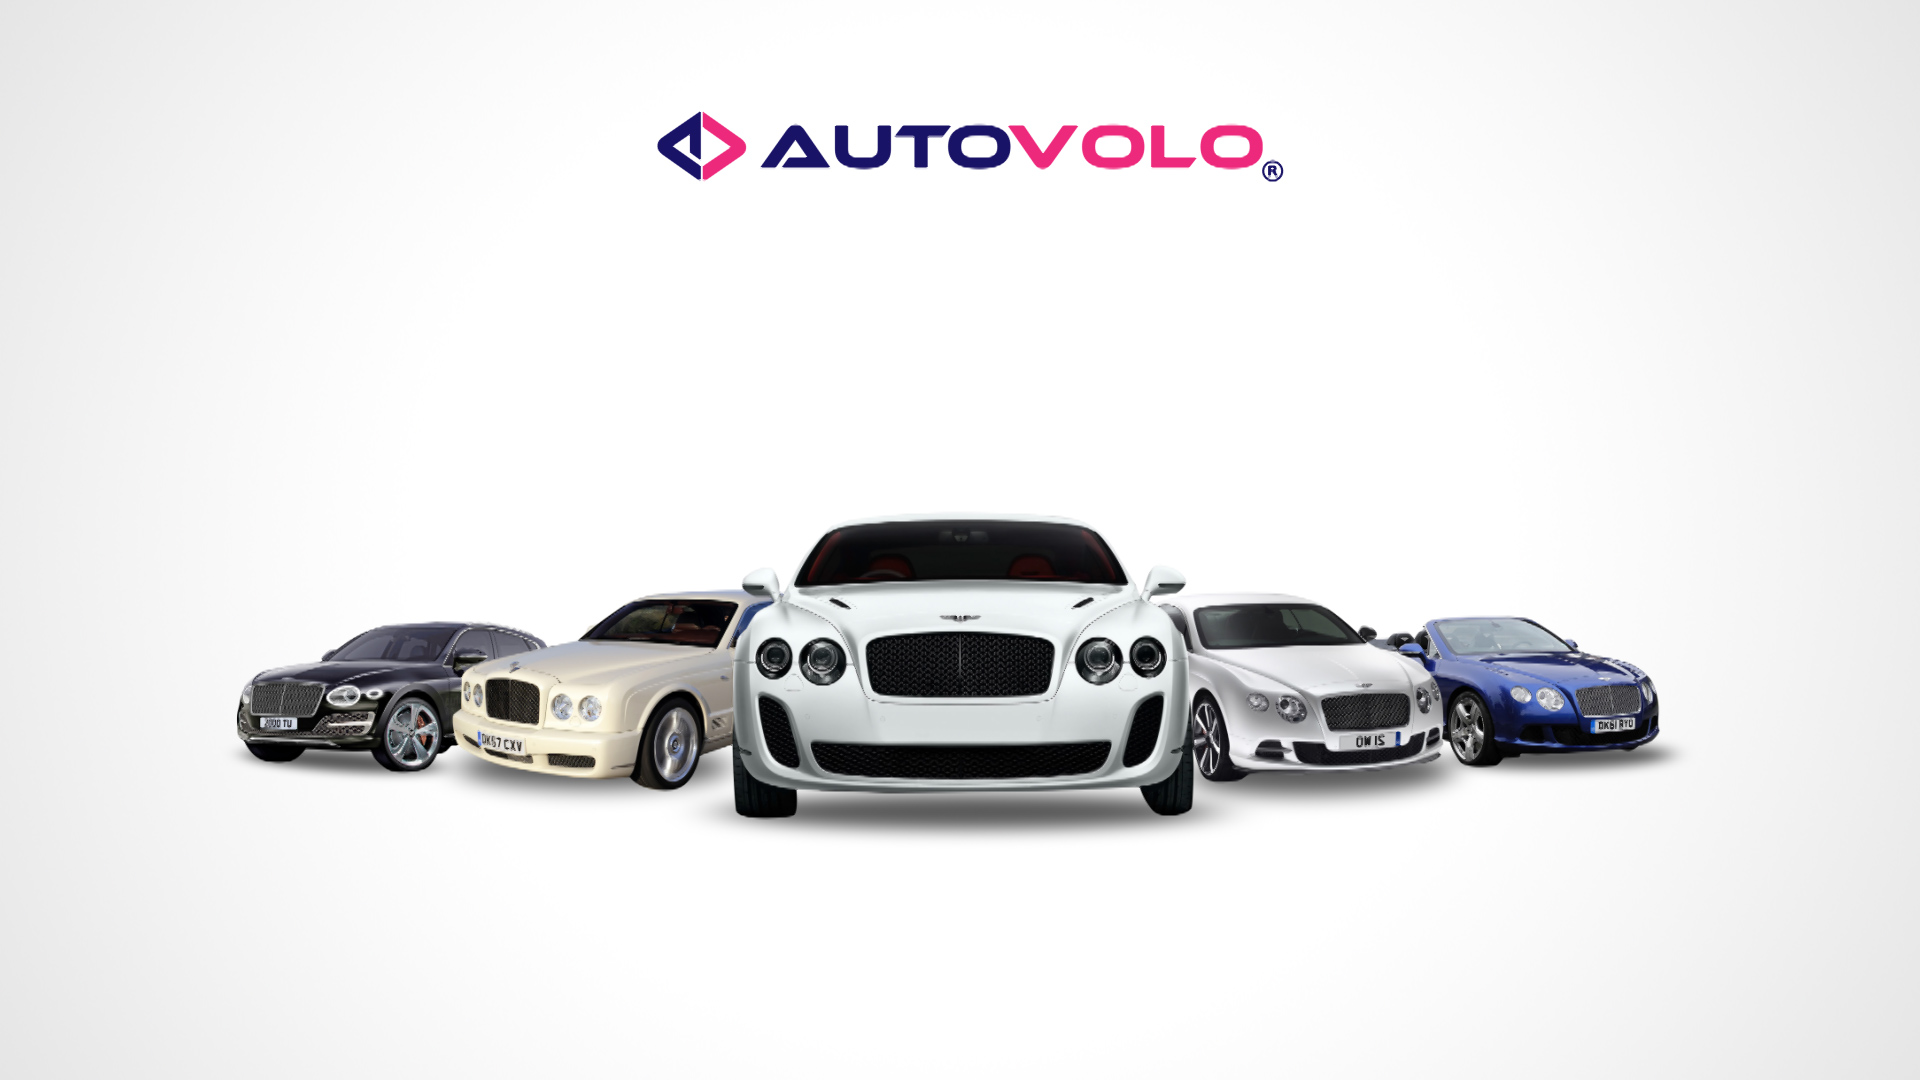 AutoVolo UK Animated TV advert